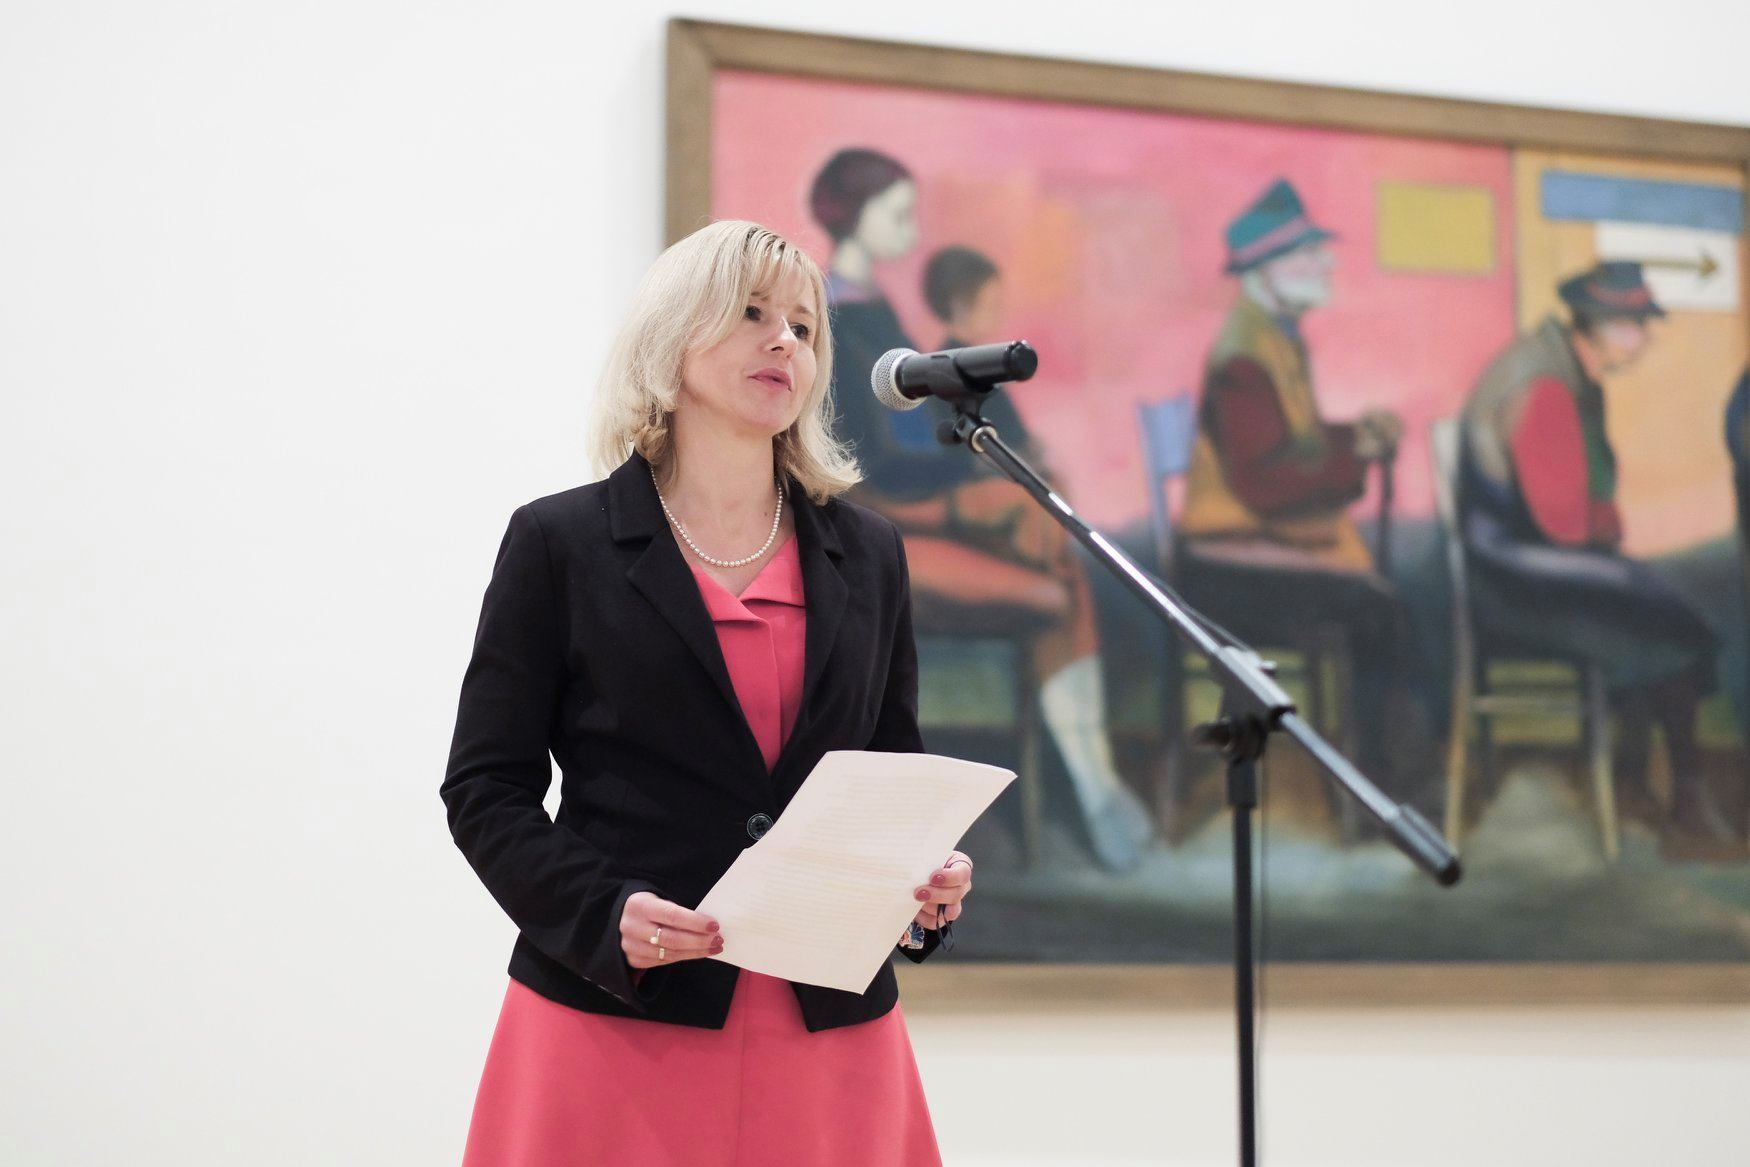 Kamilla Duda-Kawecka, consul of Republic of Poland in Ljubljana, reading a letter by the ambassador Krzysztof Olendzki